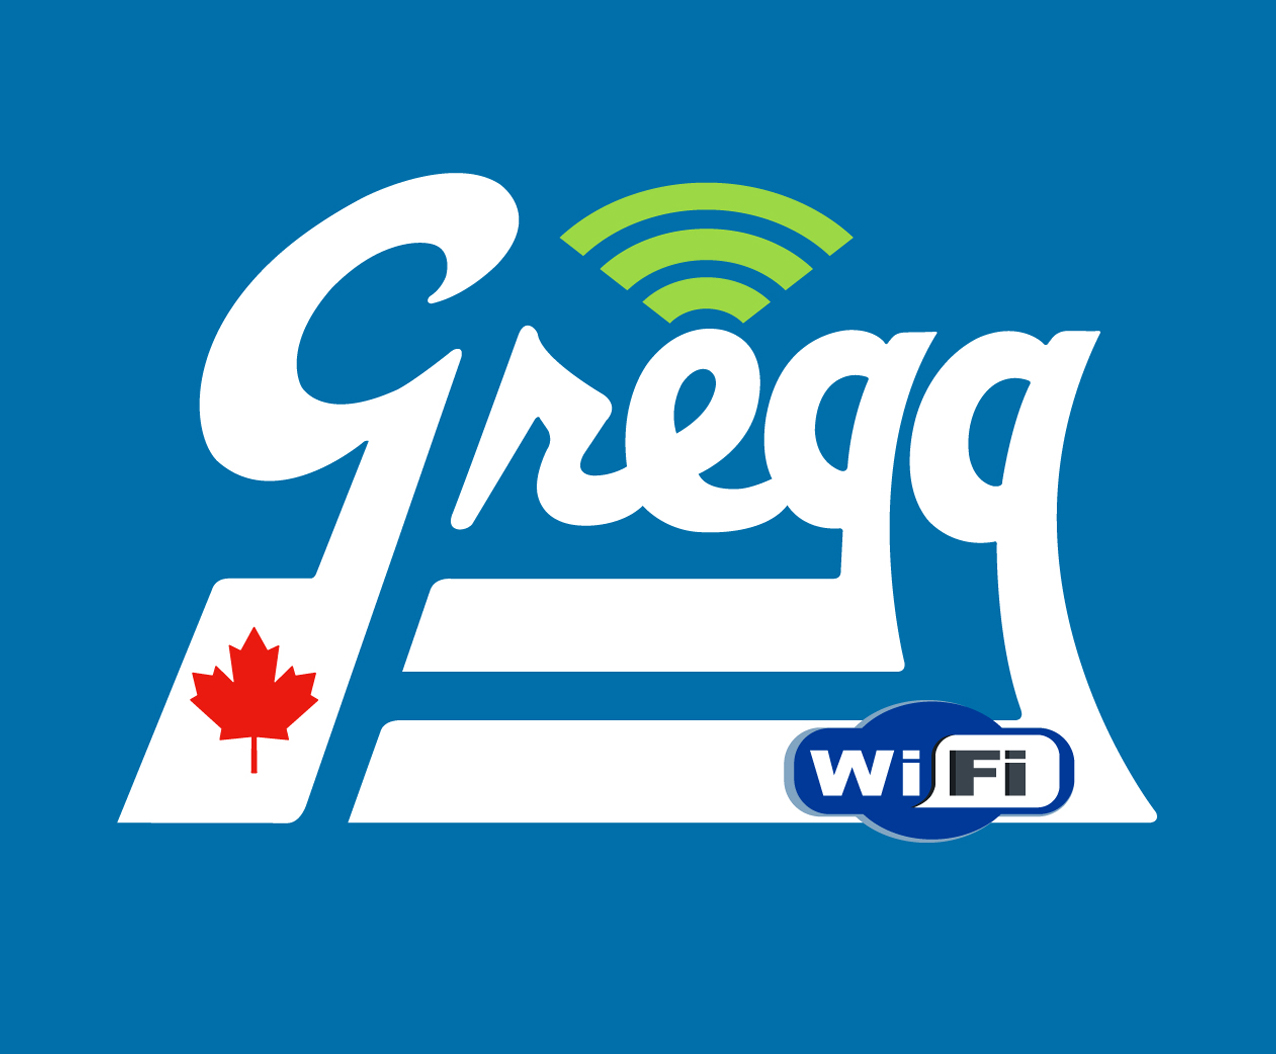 Gregg's WIFI Logo